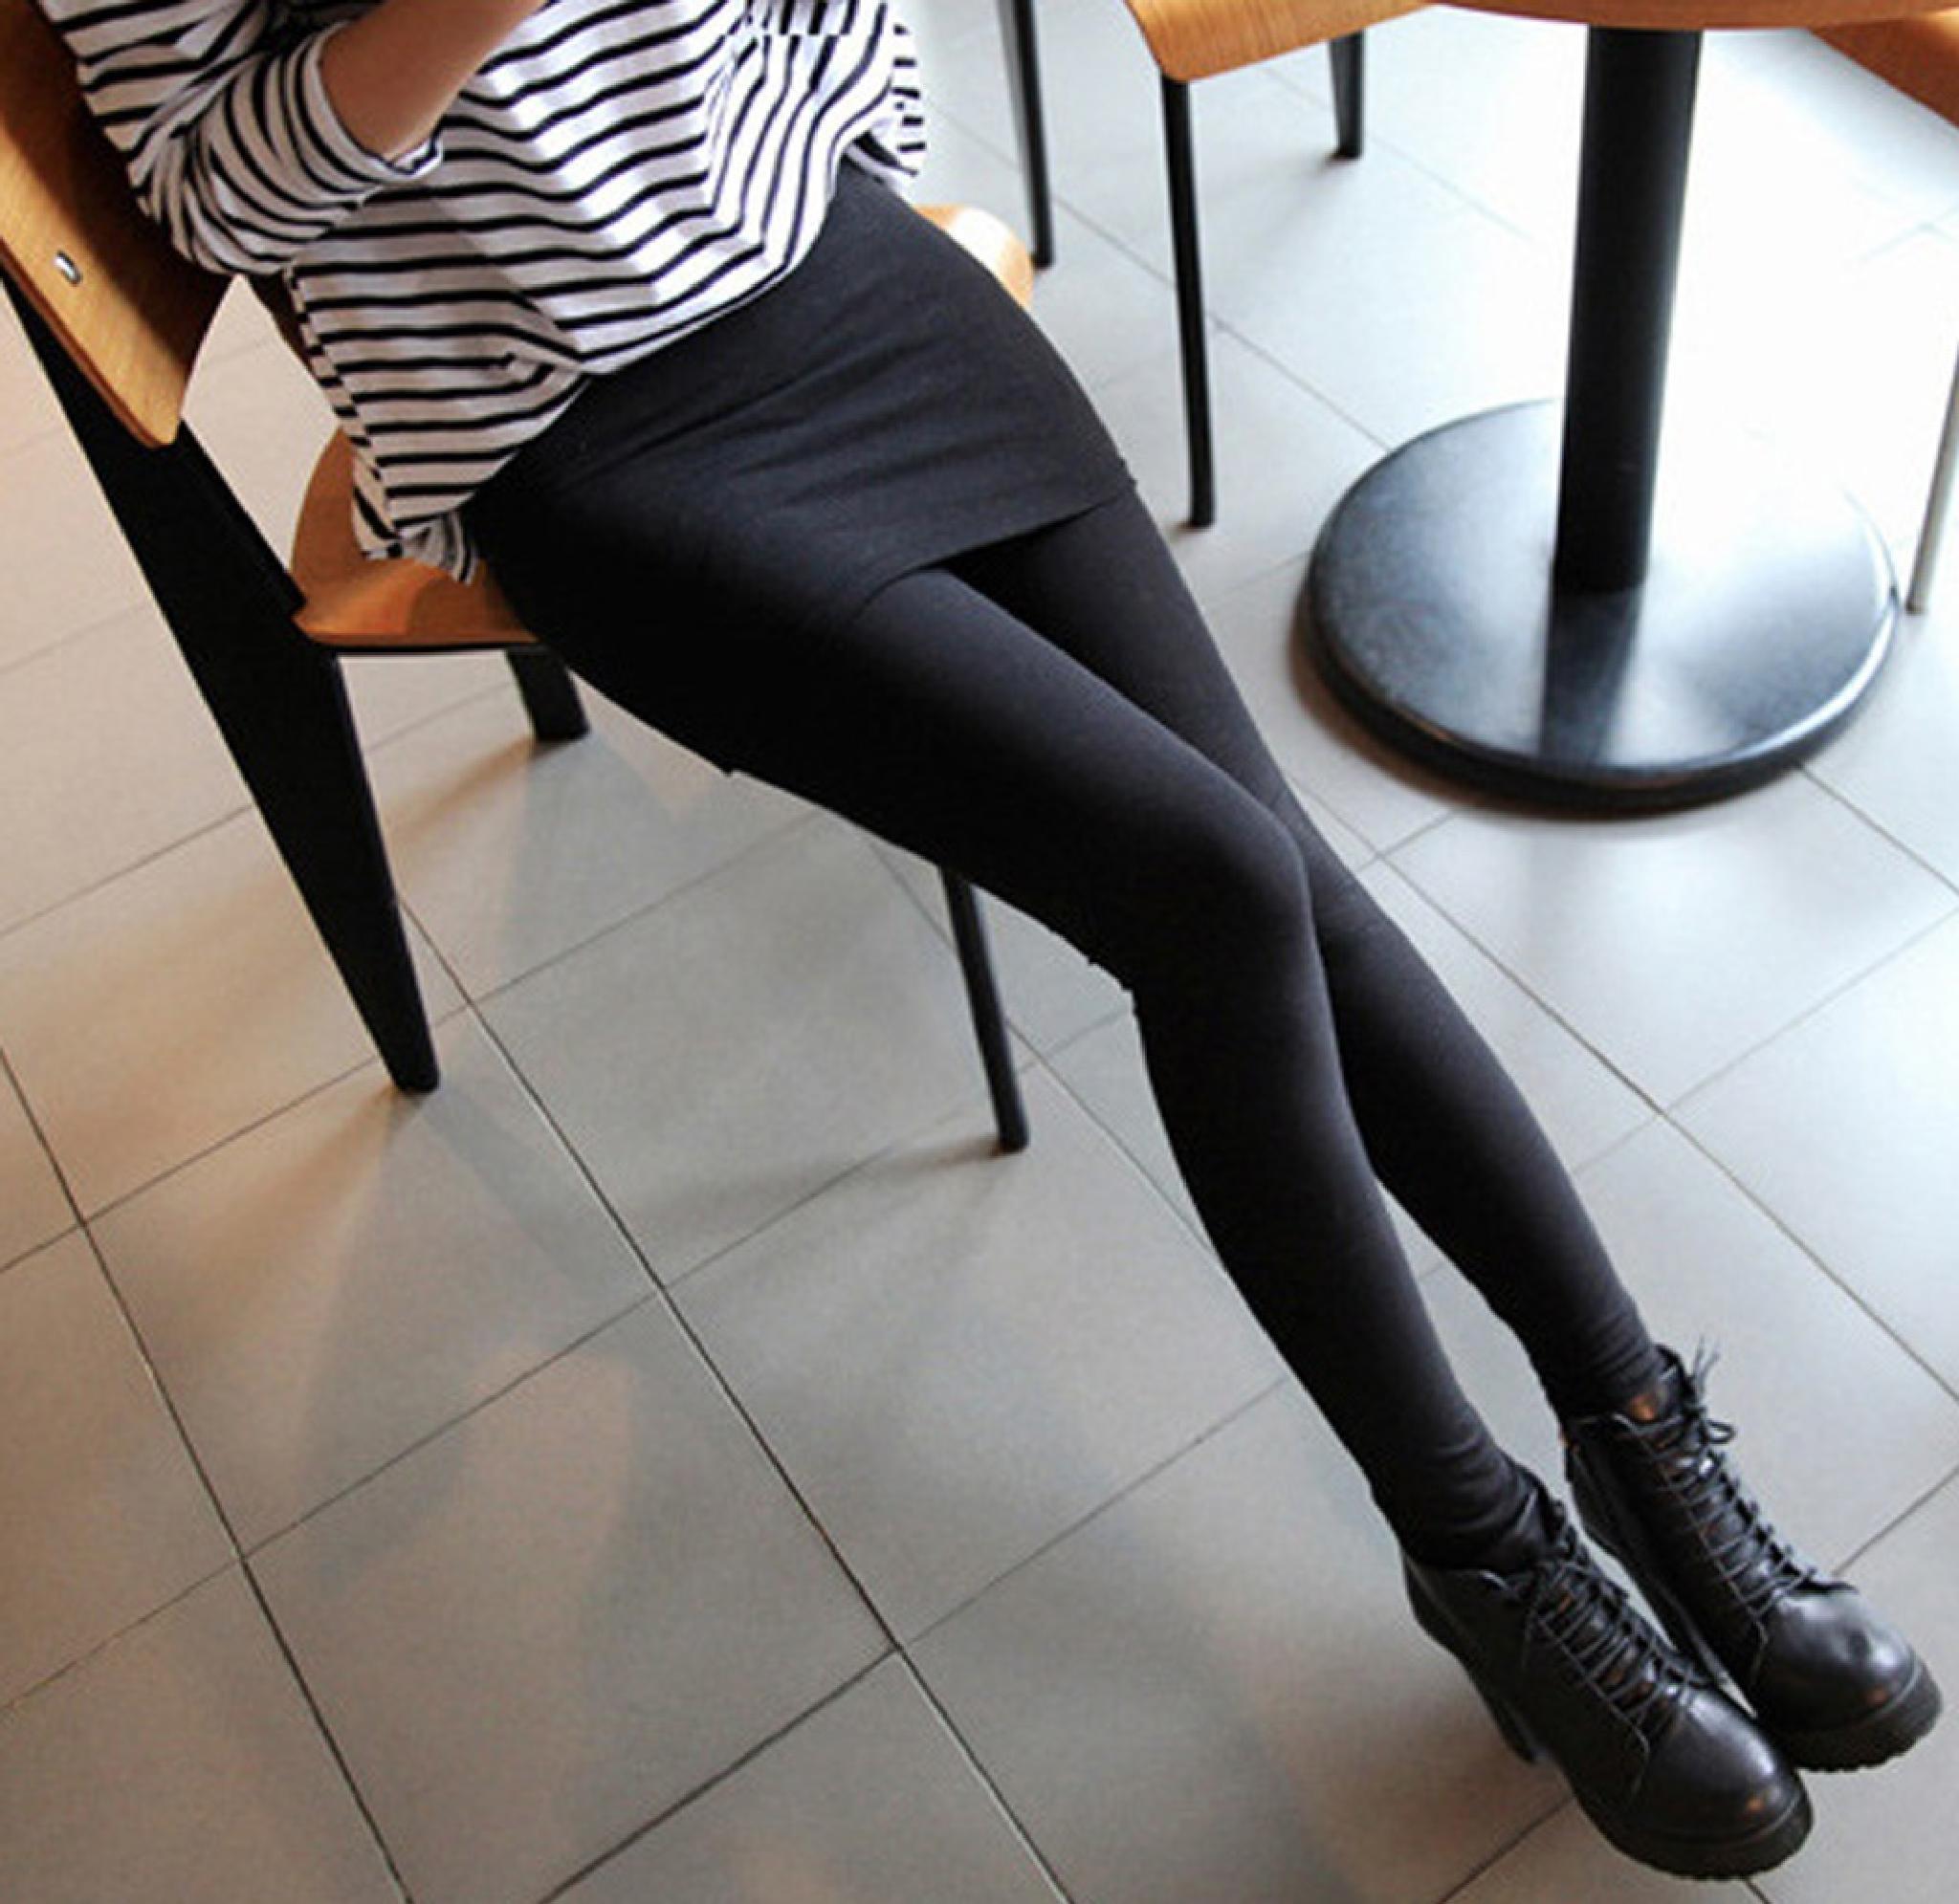 WOMEN'S CASUAL NEW LOOK FITTED SKIRT STYLE BLACK LEGGINGS  by GabriellaAlexus